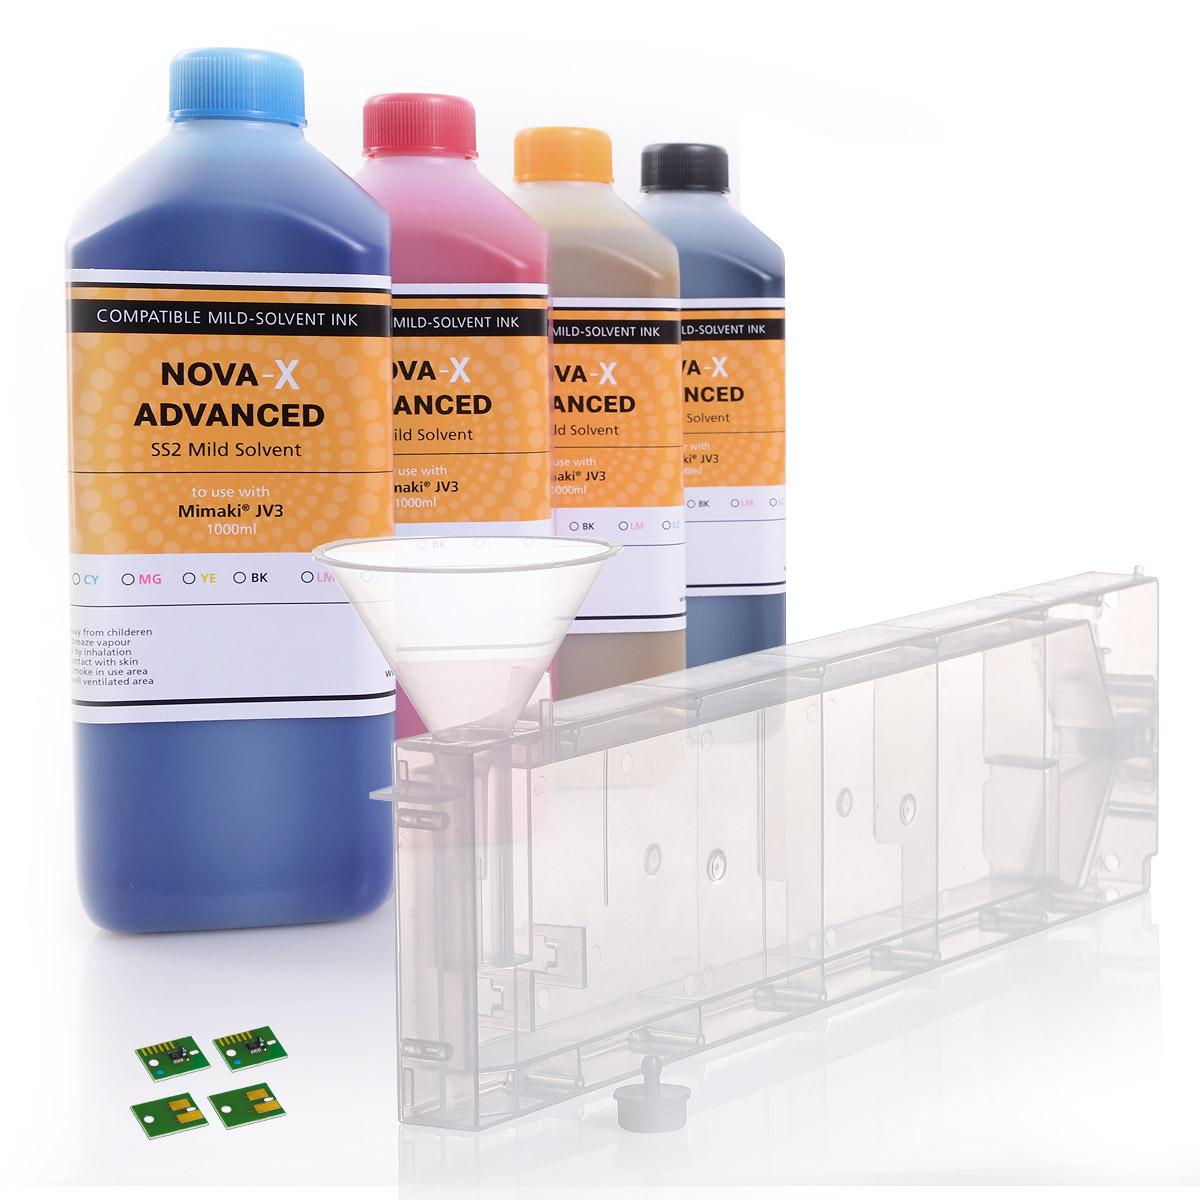 4c | Starterset für Mimaki® JV3 | NOVA-X® SS2 Mild Solvent | Permanent Chip